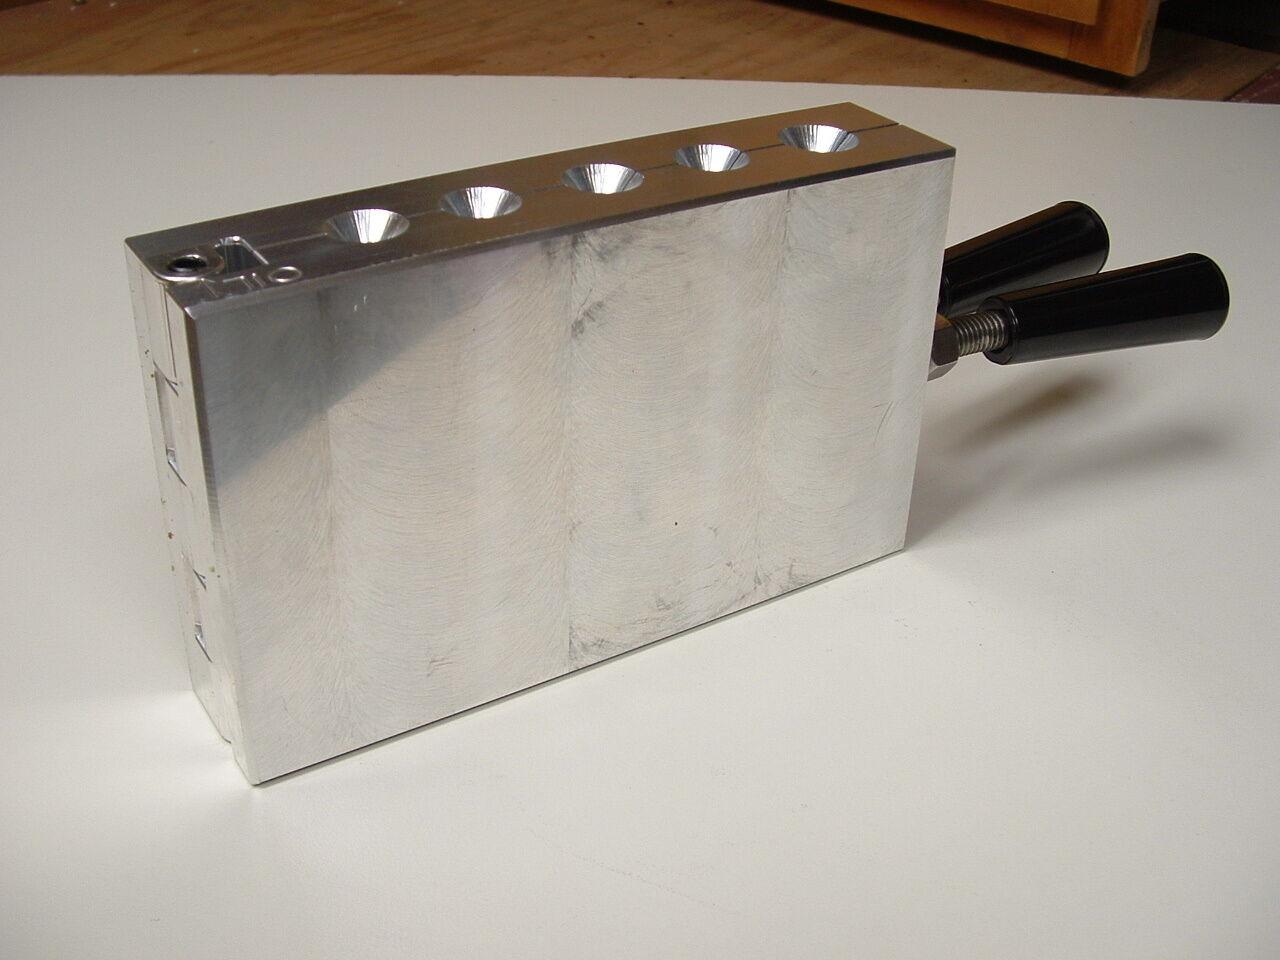 Molde De Agua Salada Trolling Platina 2, 4, 6, 6, 6, 8, 10oz CNC Aluminio Trol 0730e7